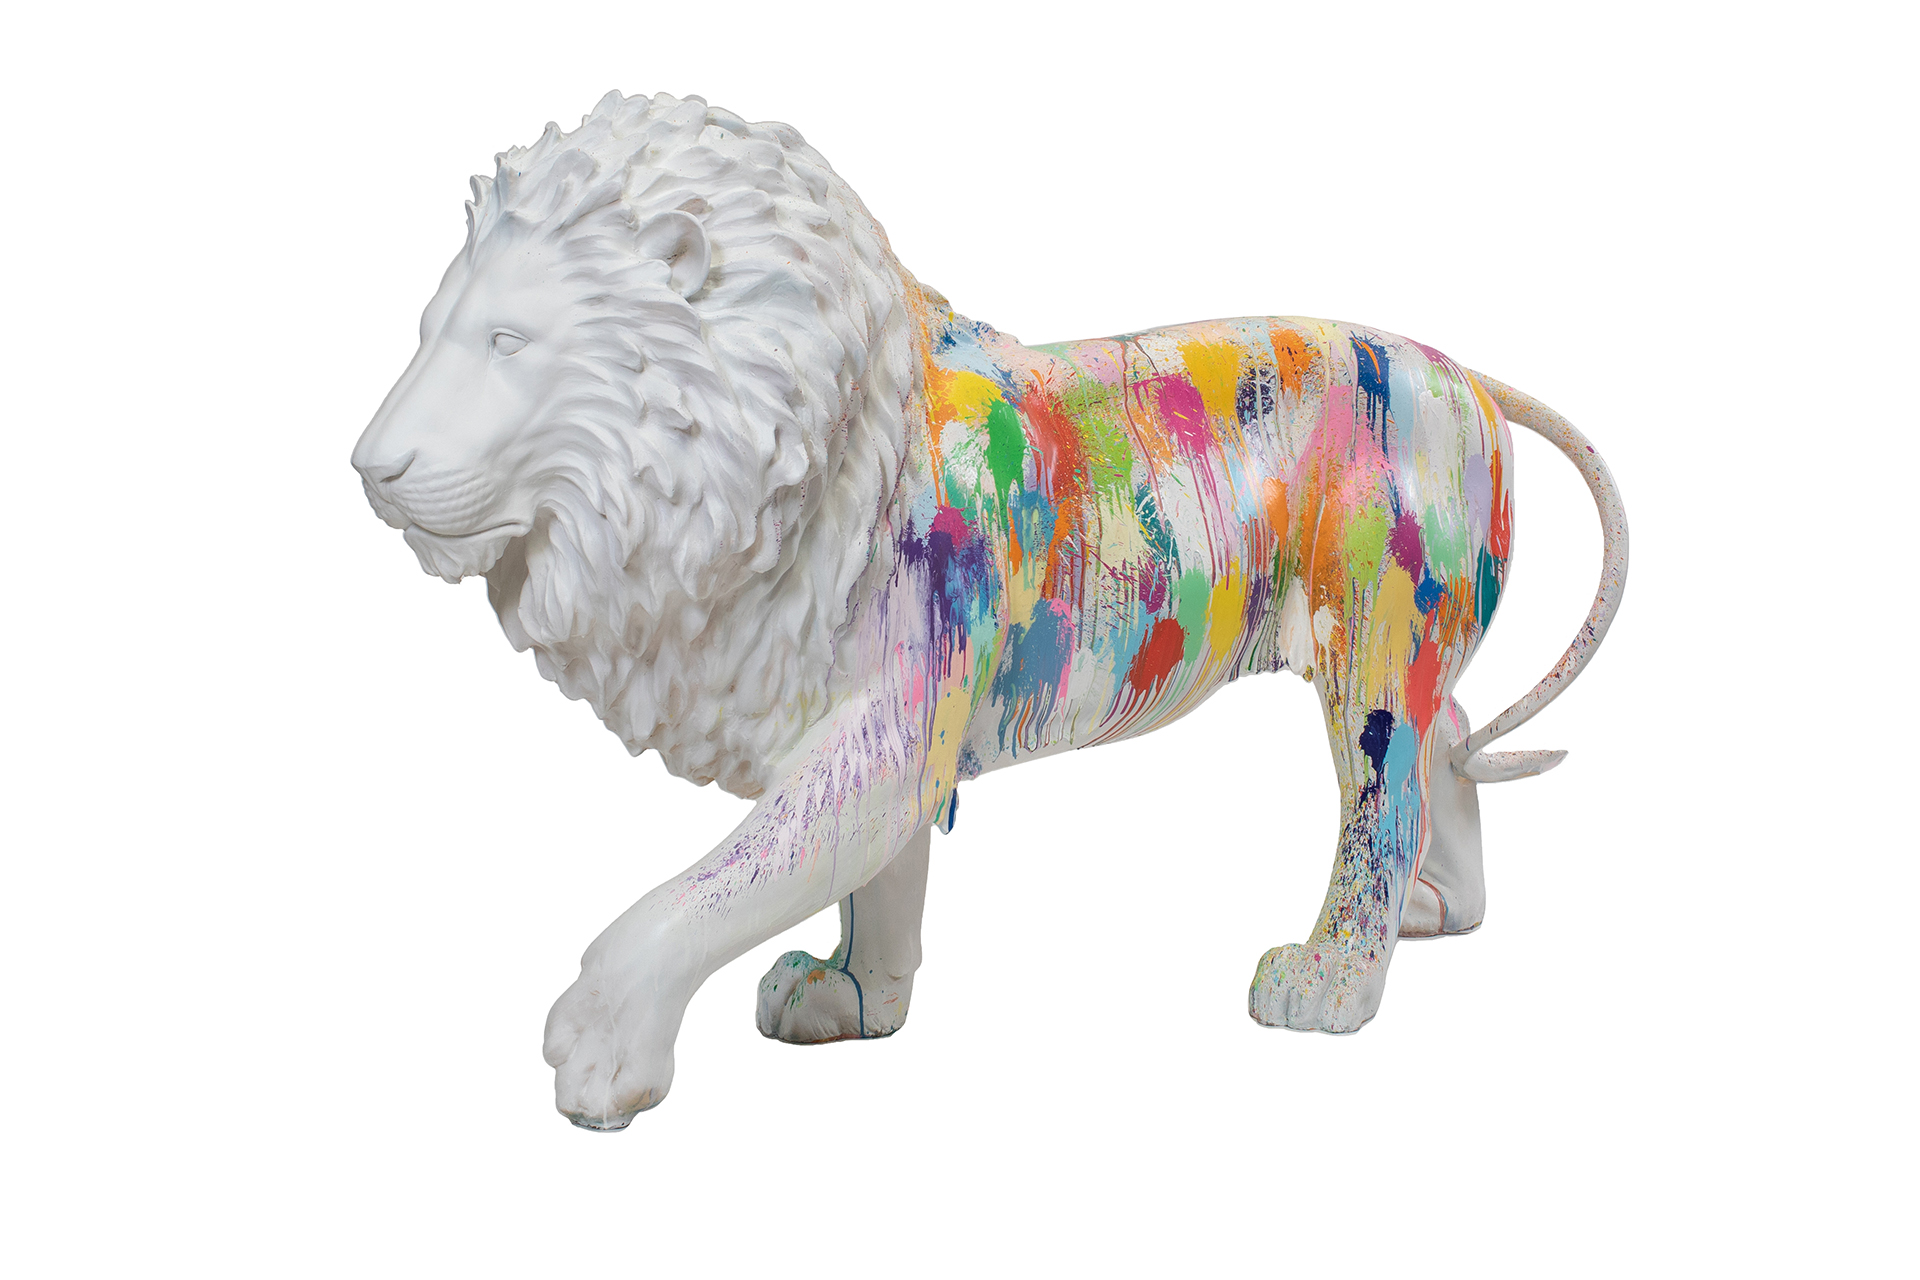 Tusk Lion Trail 2021 - Ian Davenport - Generously sponsored by Mishcon de Reya Image Credit: Nick Andrews